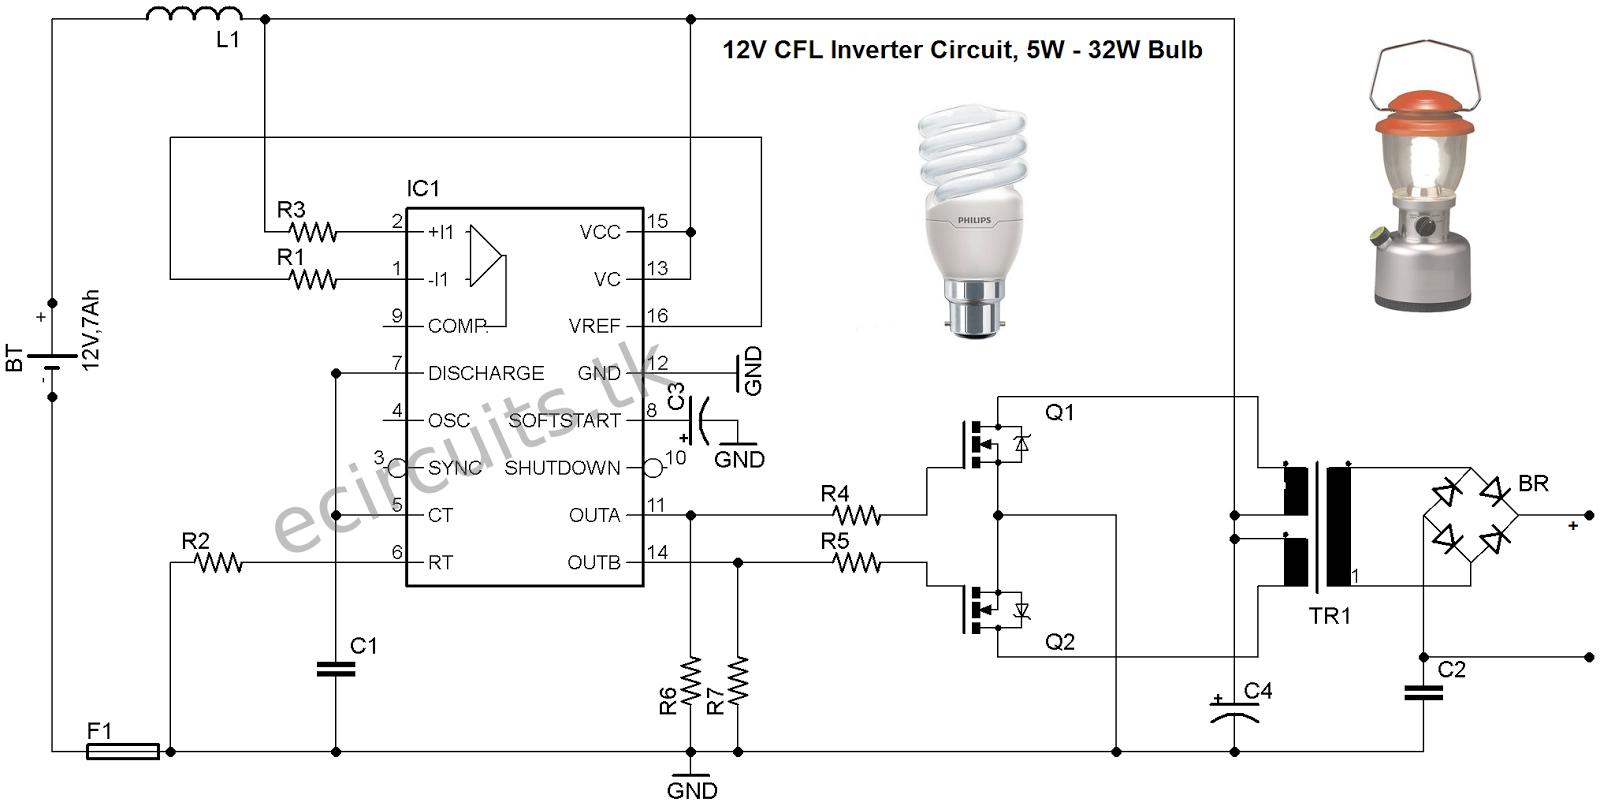 medium resolution of lighting schematics circuit skemarangkaian com emergency led emergency light circuit diagram cfl ballast circuit diagram led